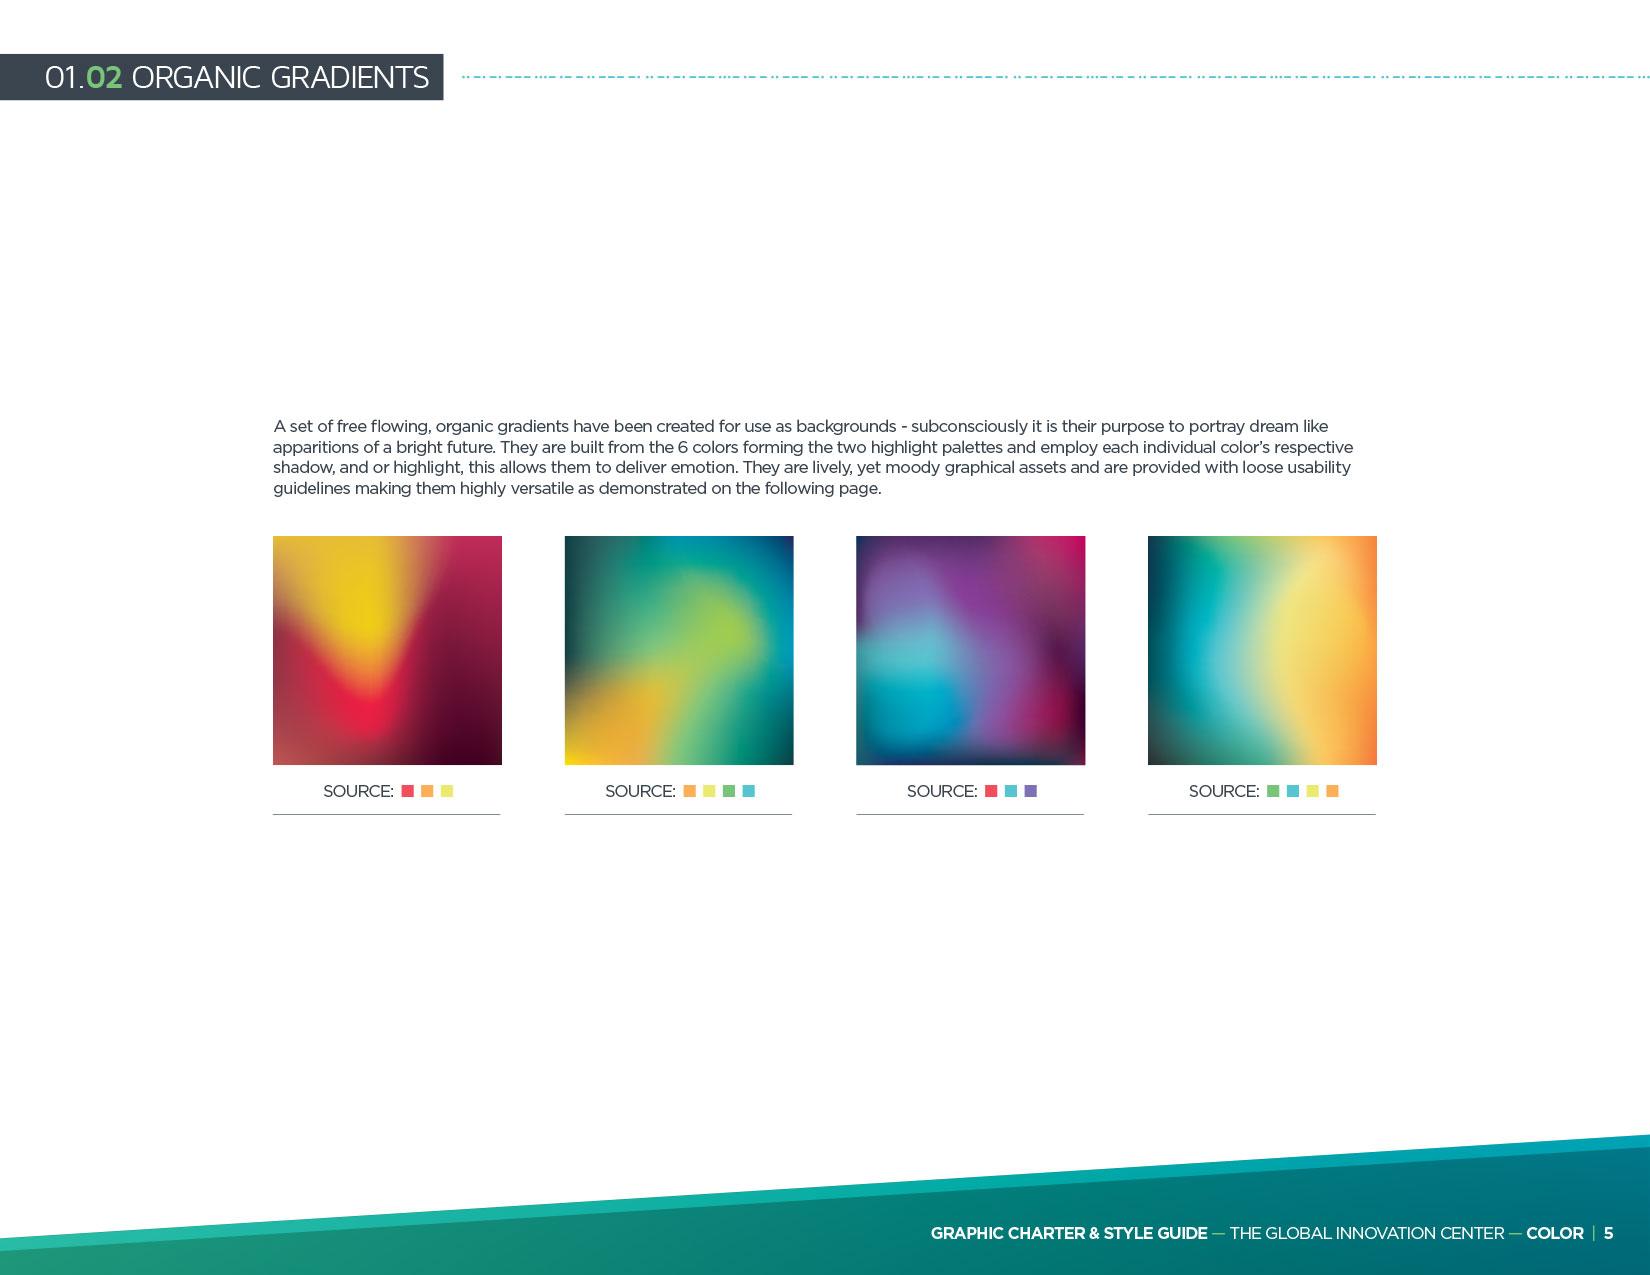 GIPC Style Guide 5